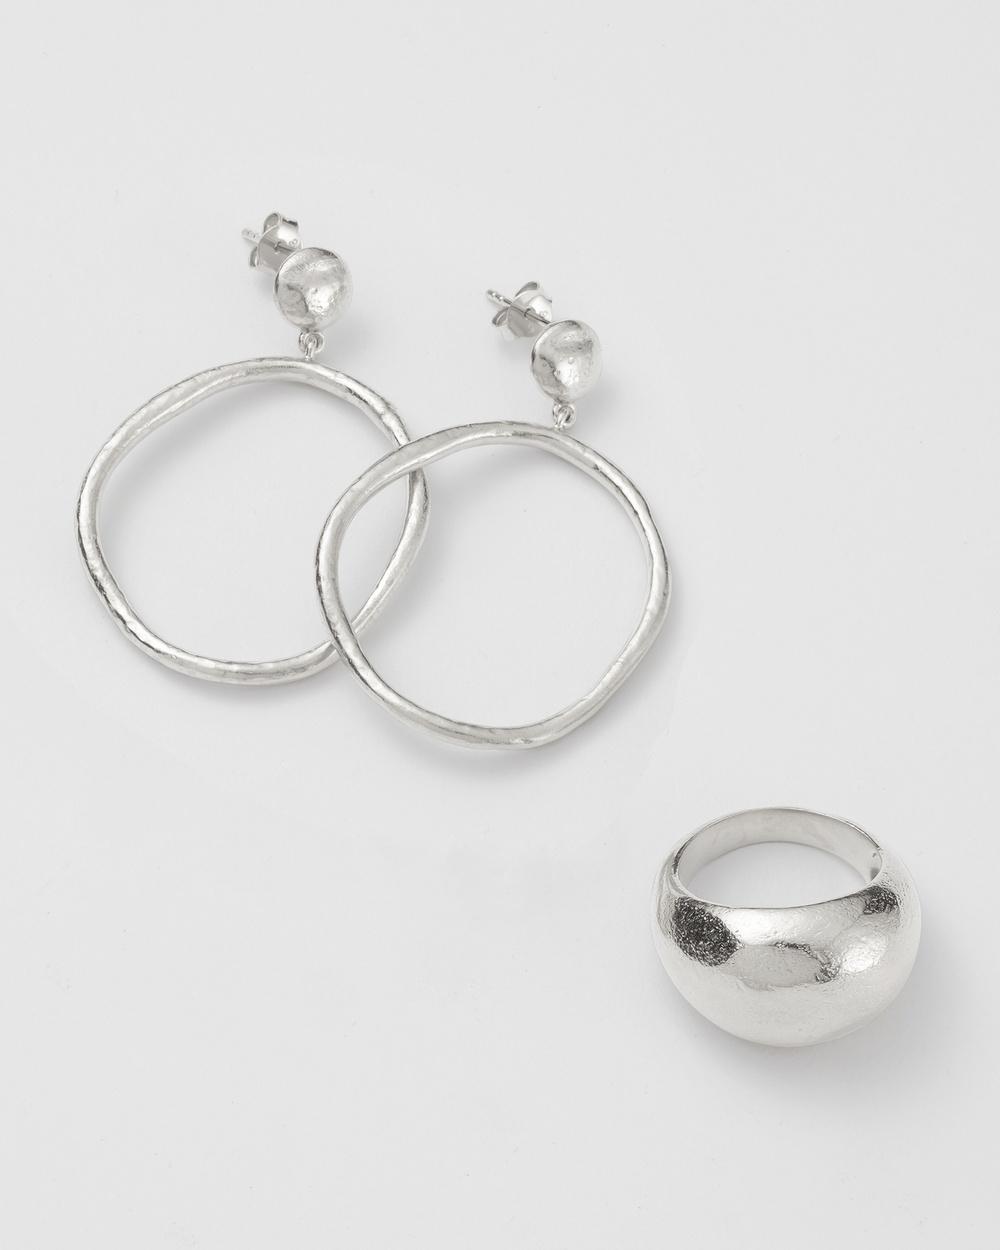 Kirstin Ash Lisa Danielle's Golden Light Layers Jewellery Silver